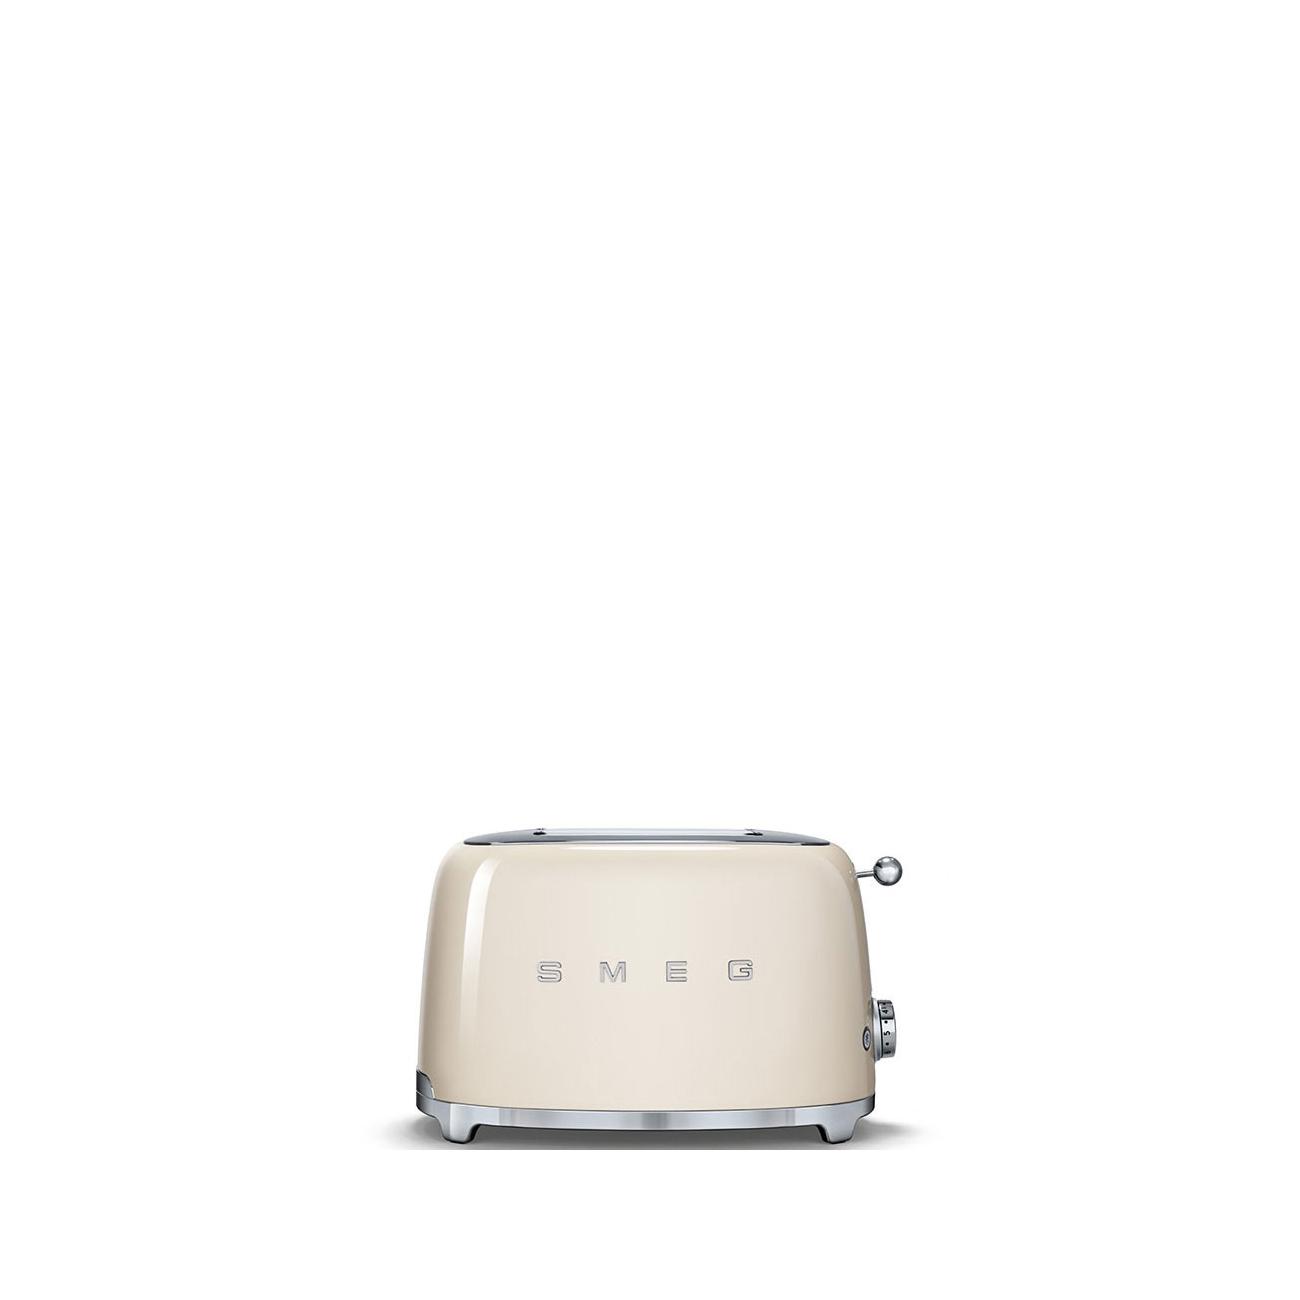 smeg 2 slice toasters cream tattahome. Black Bedroom Furniture Sets. Home Design Ideas